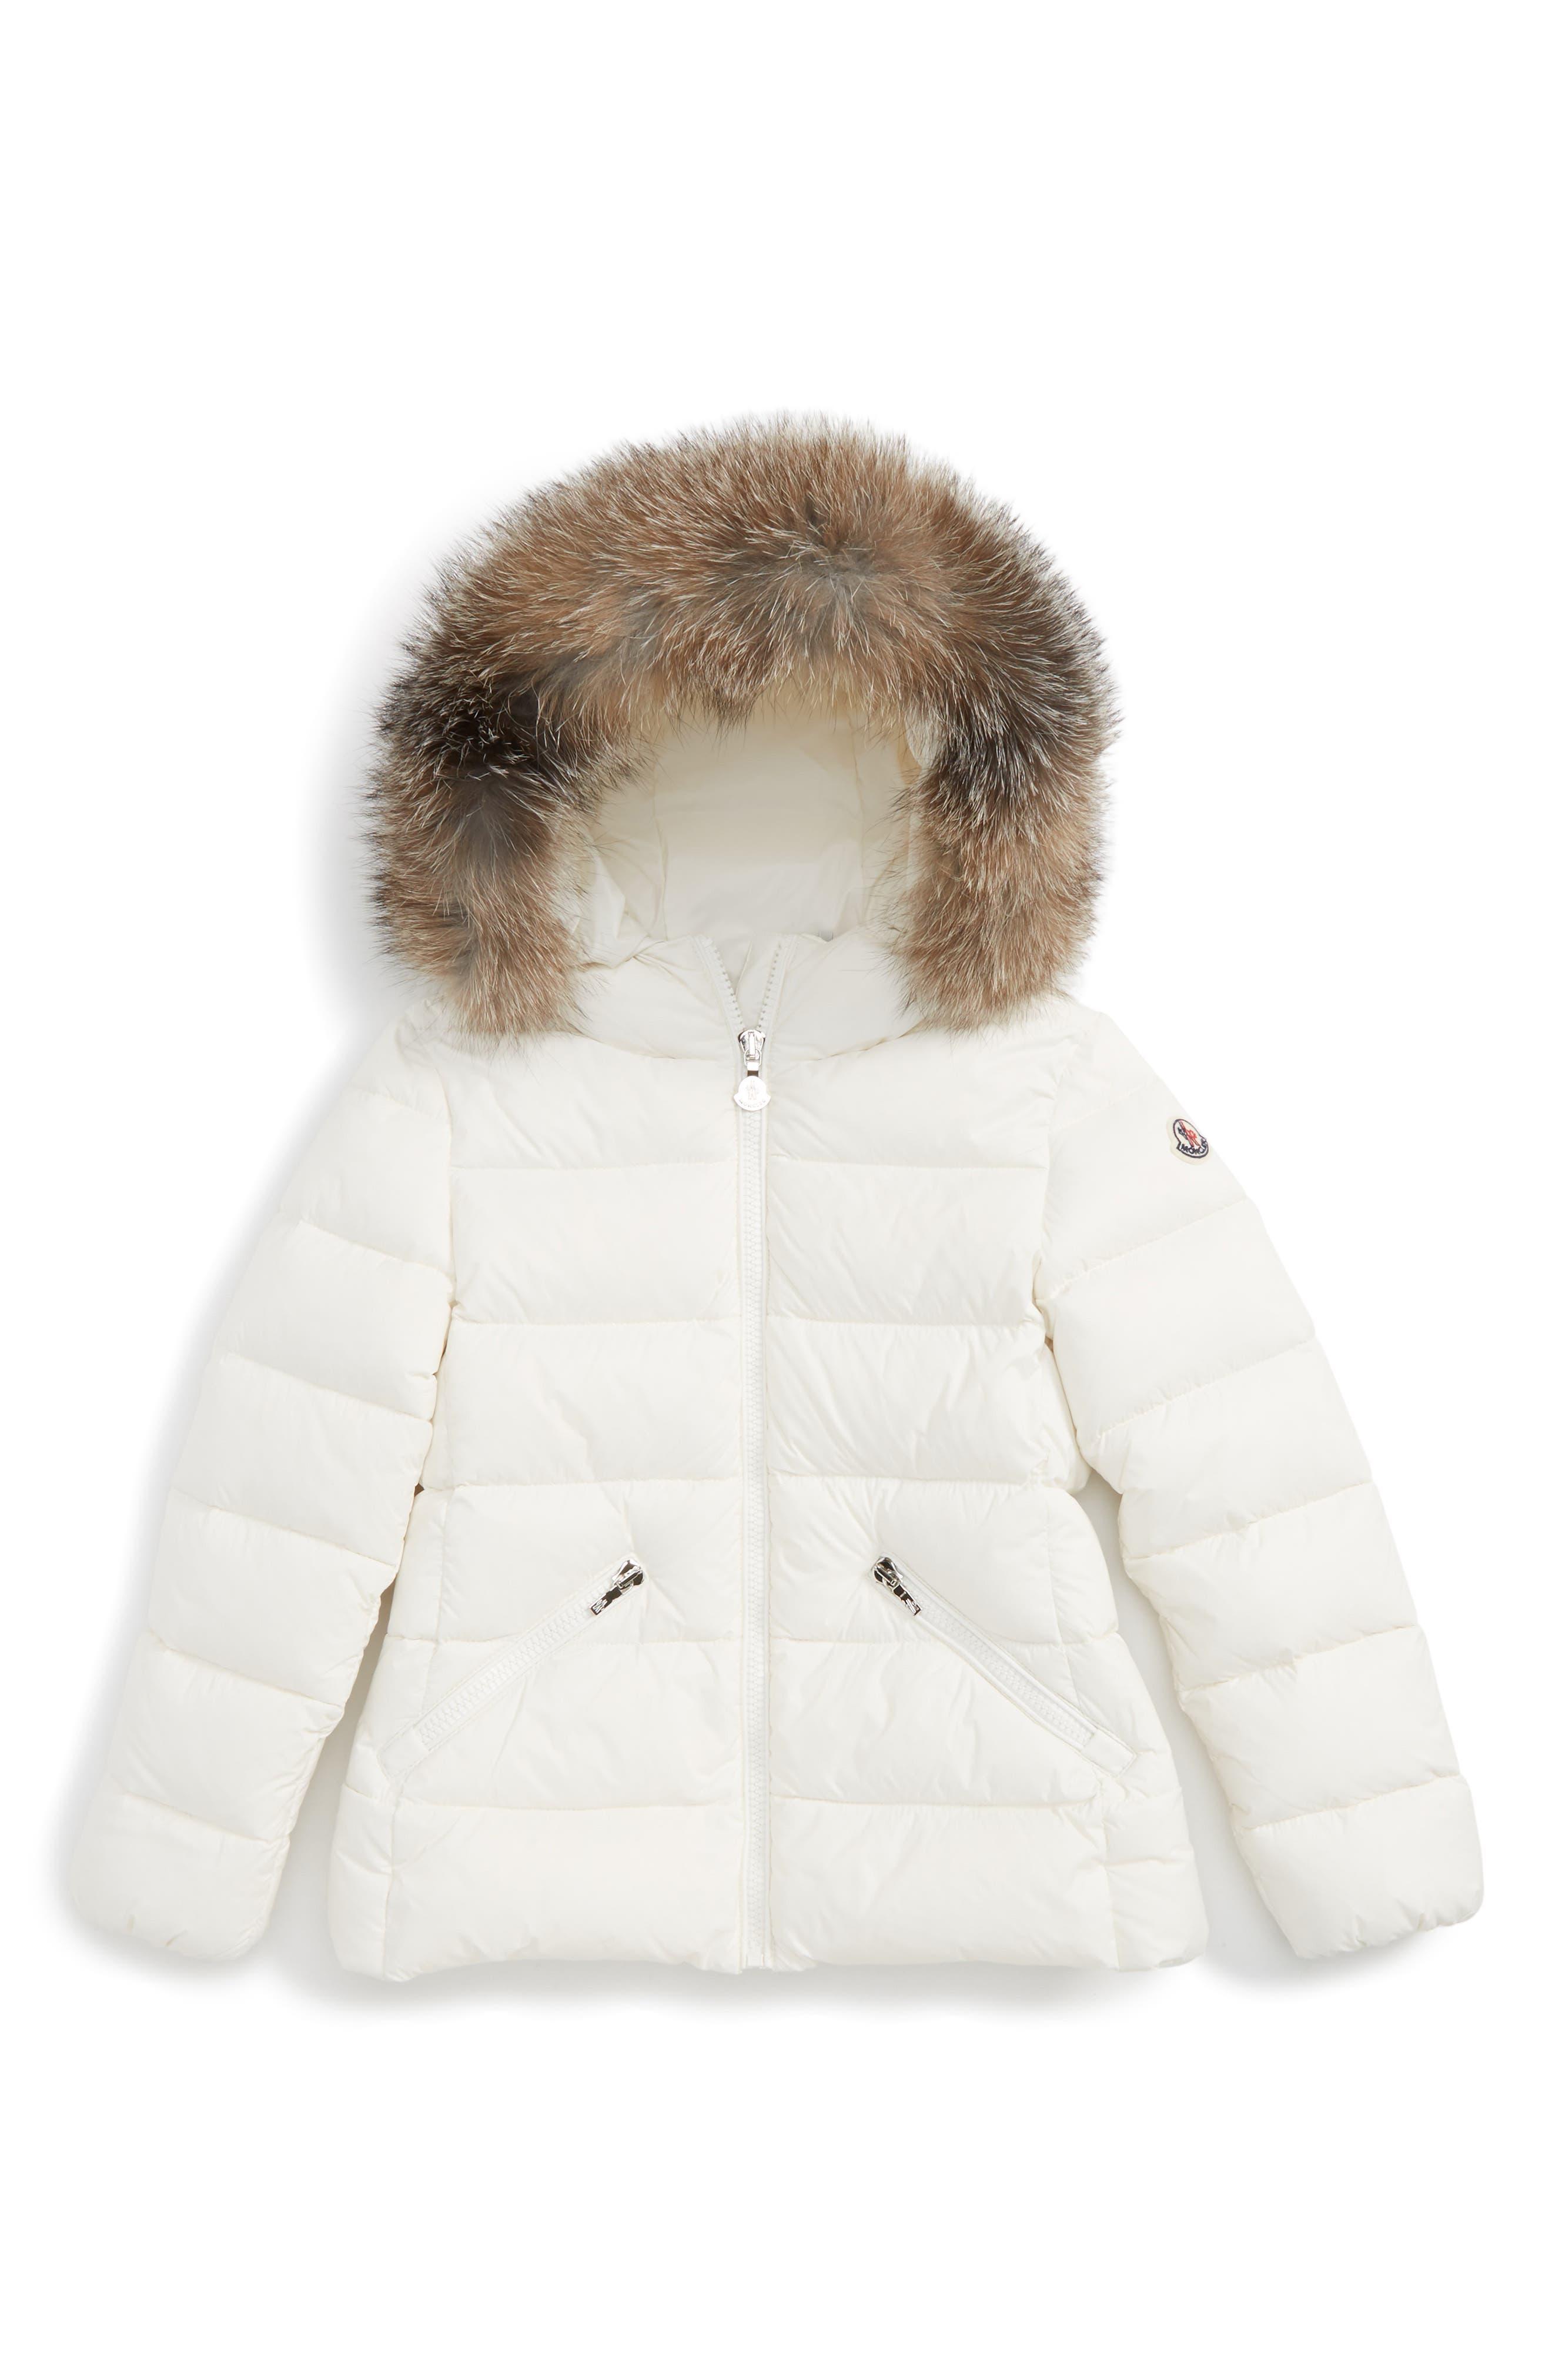 Aimeet Hooded Down Jacket with Genuine Fox Fur,                             Main thumbnail 1, color,                             101